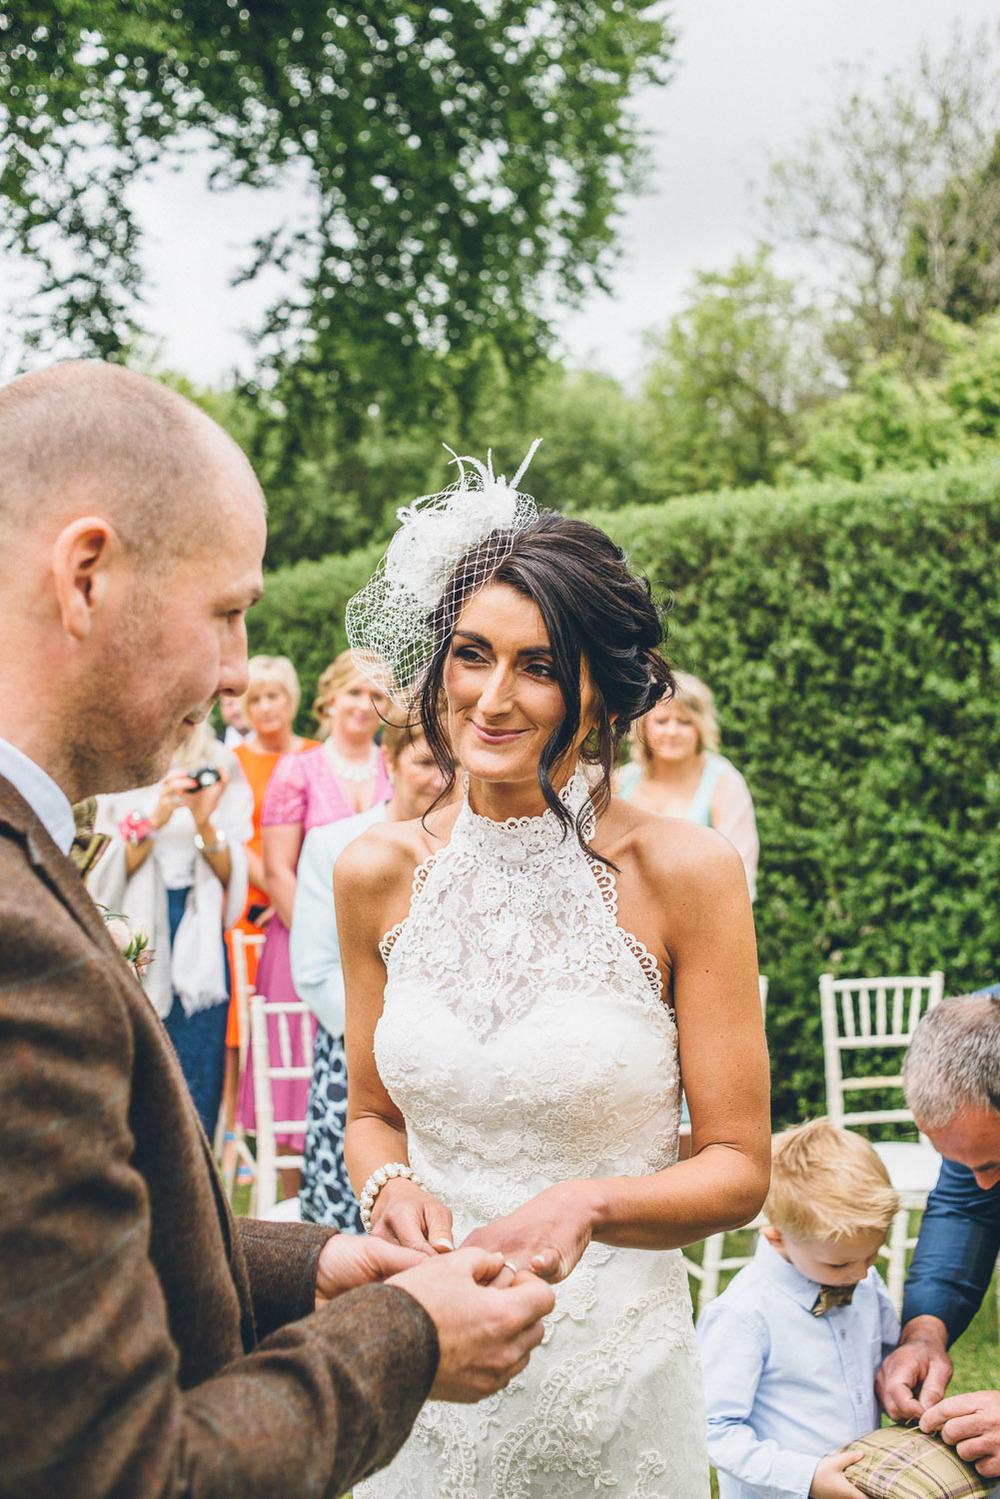 Kelly Mcallister photography Belfast wedding Northern ireland wedding photographer_-29.jpg